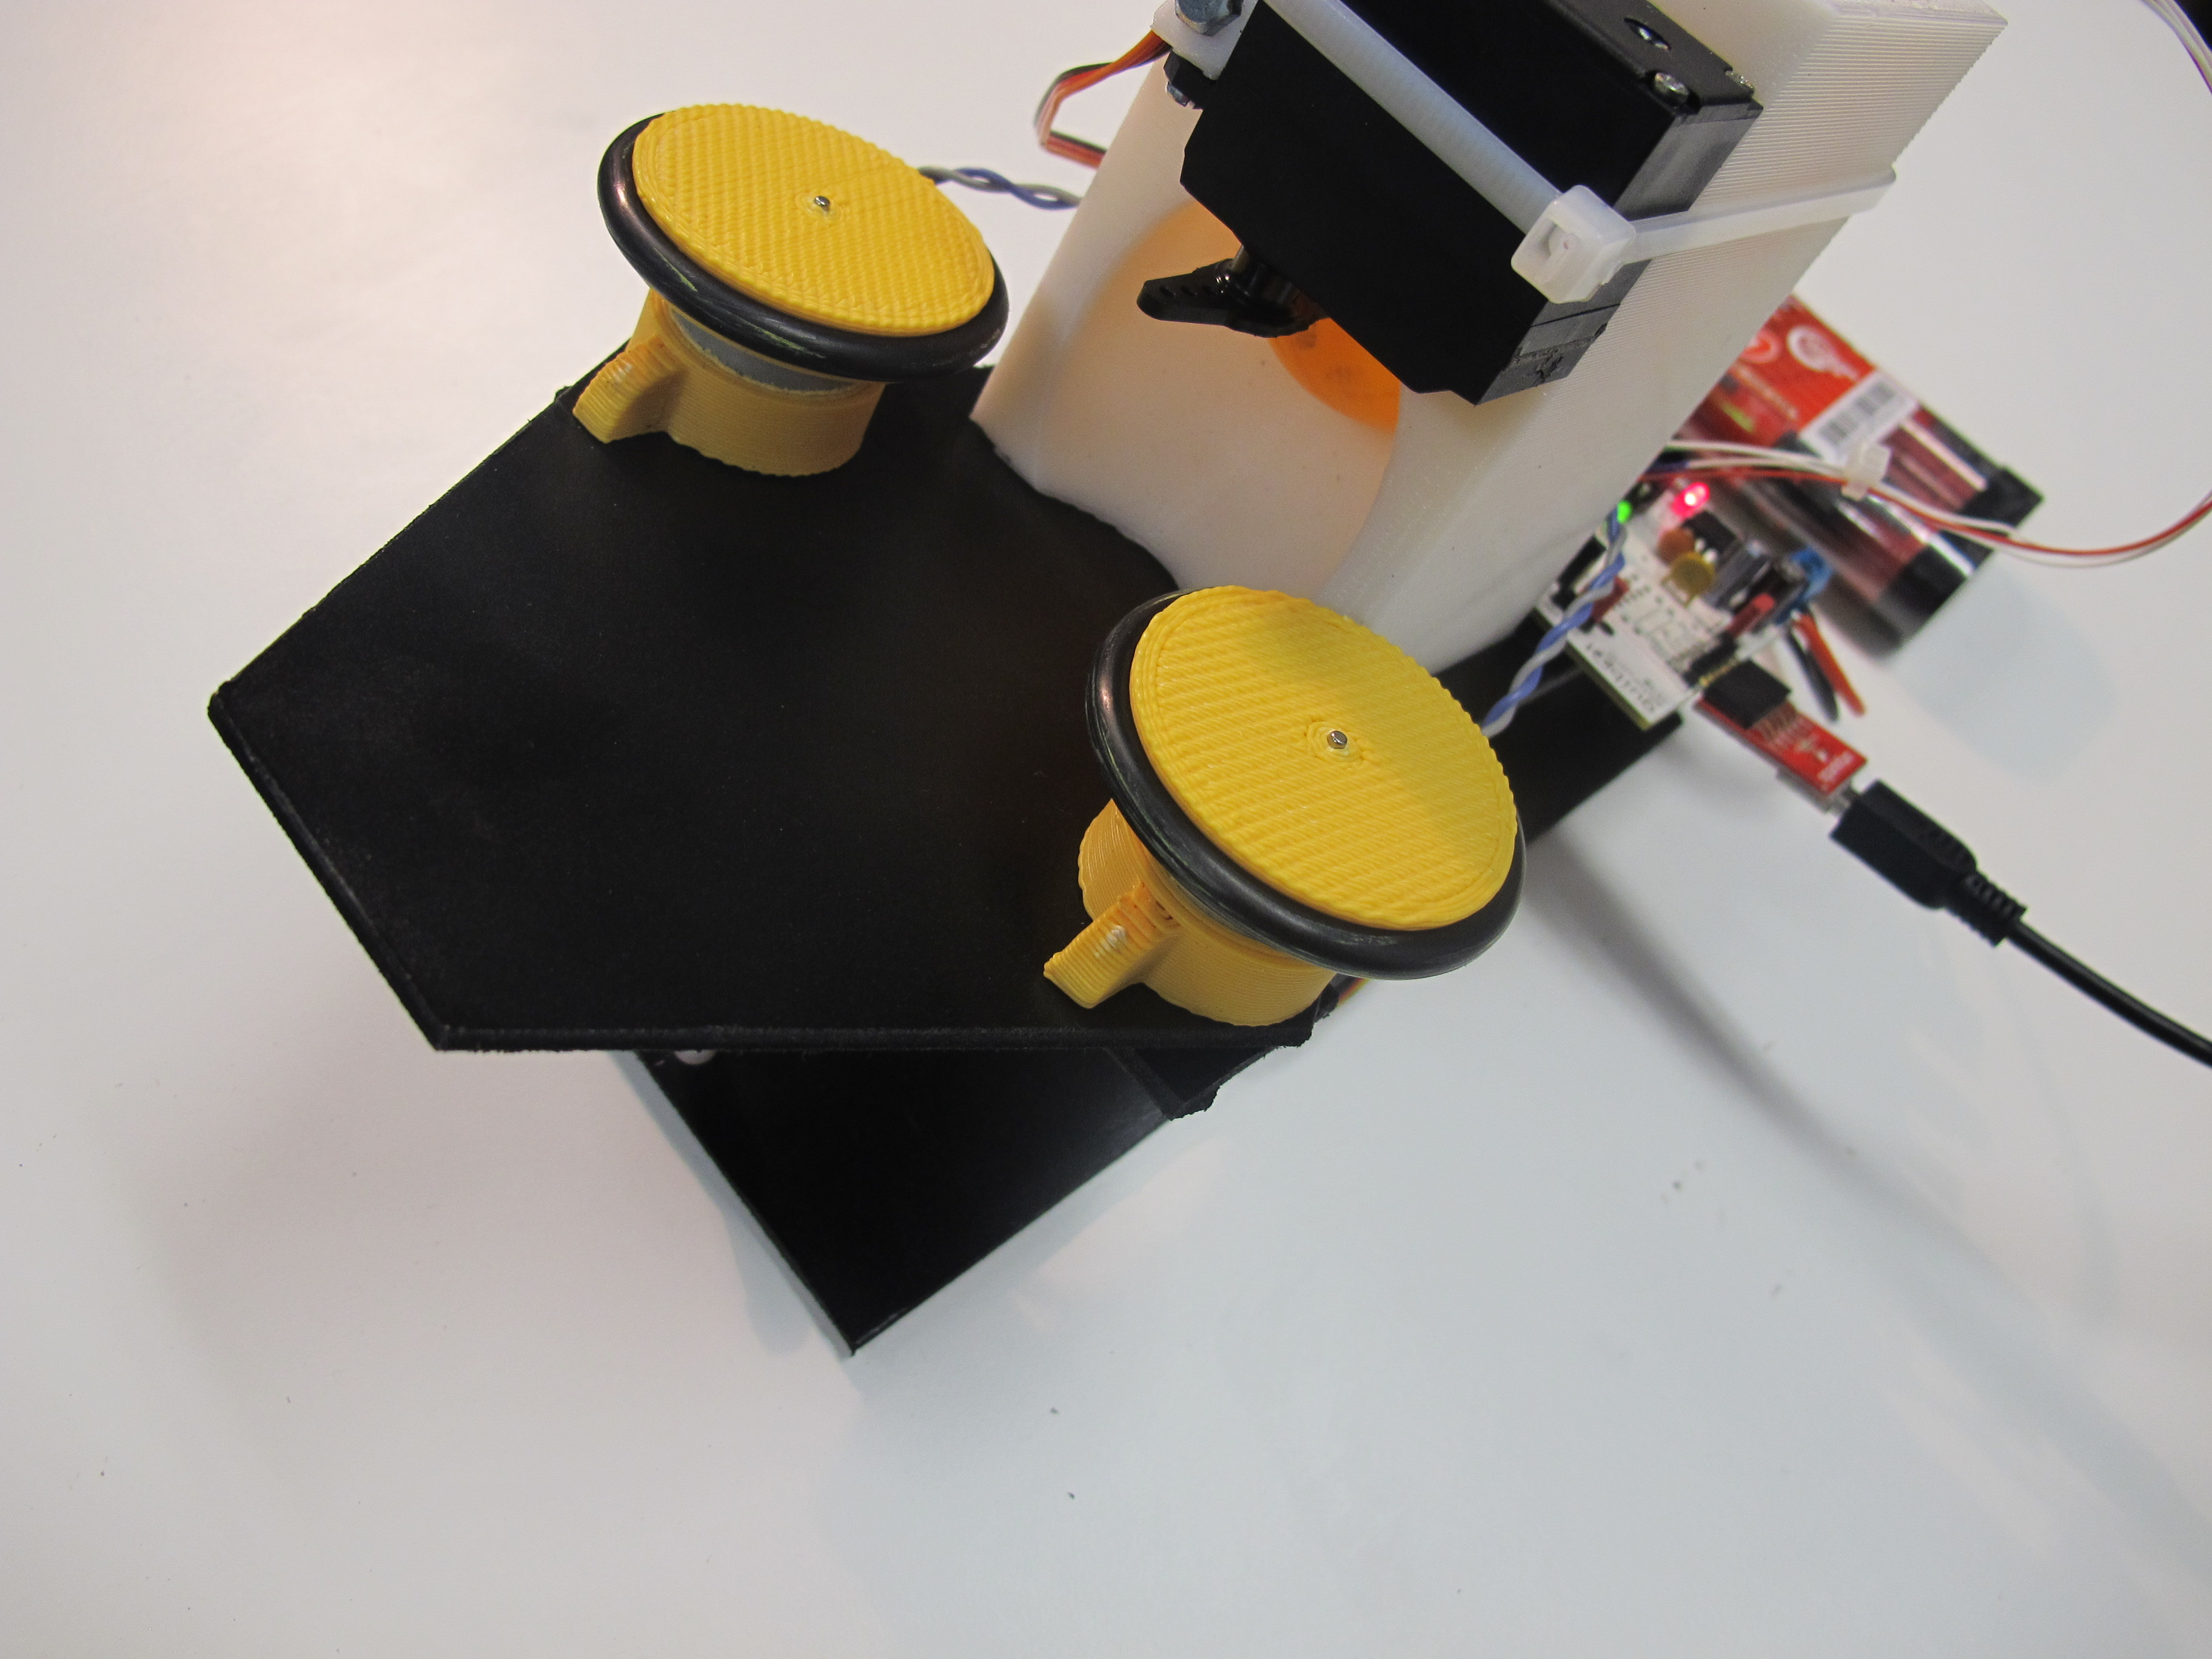 Arduino controlled Ping Pong Balls Launcher